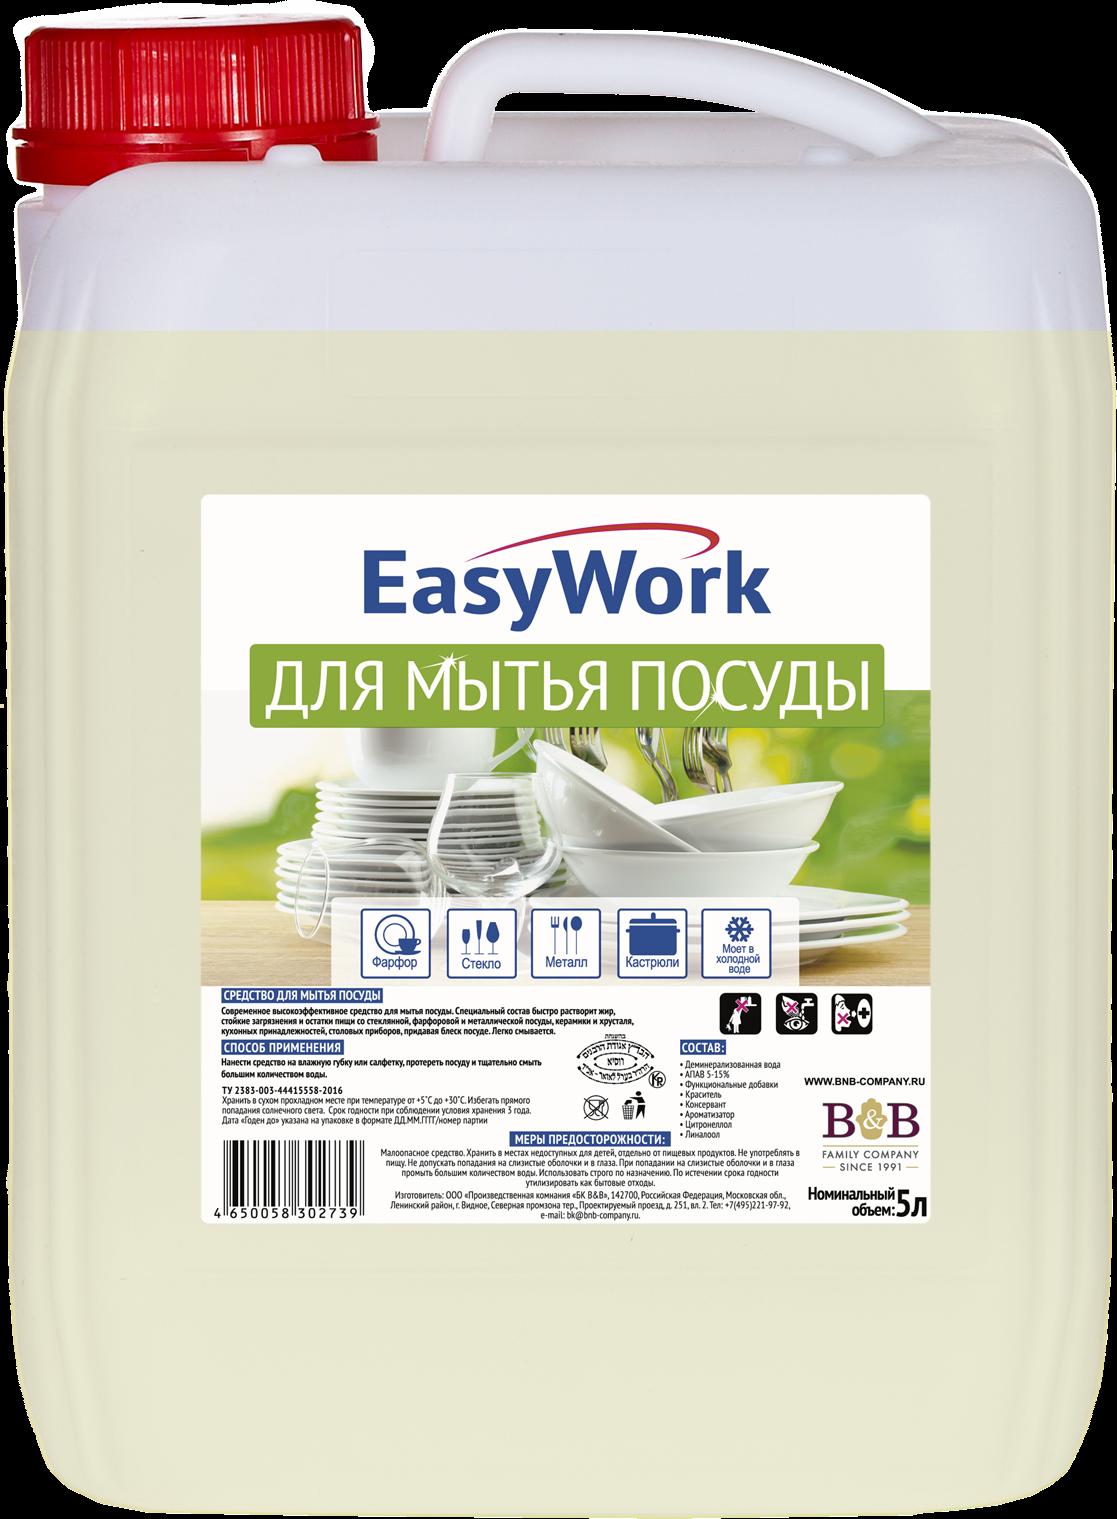 Средство для мытья посуды EasyWork Цитрус, 302739, 5 л набор фарфоровой посуды king wo 56